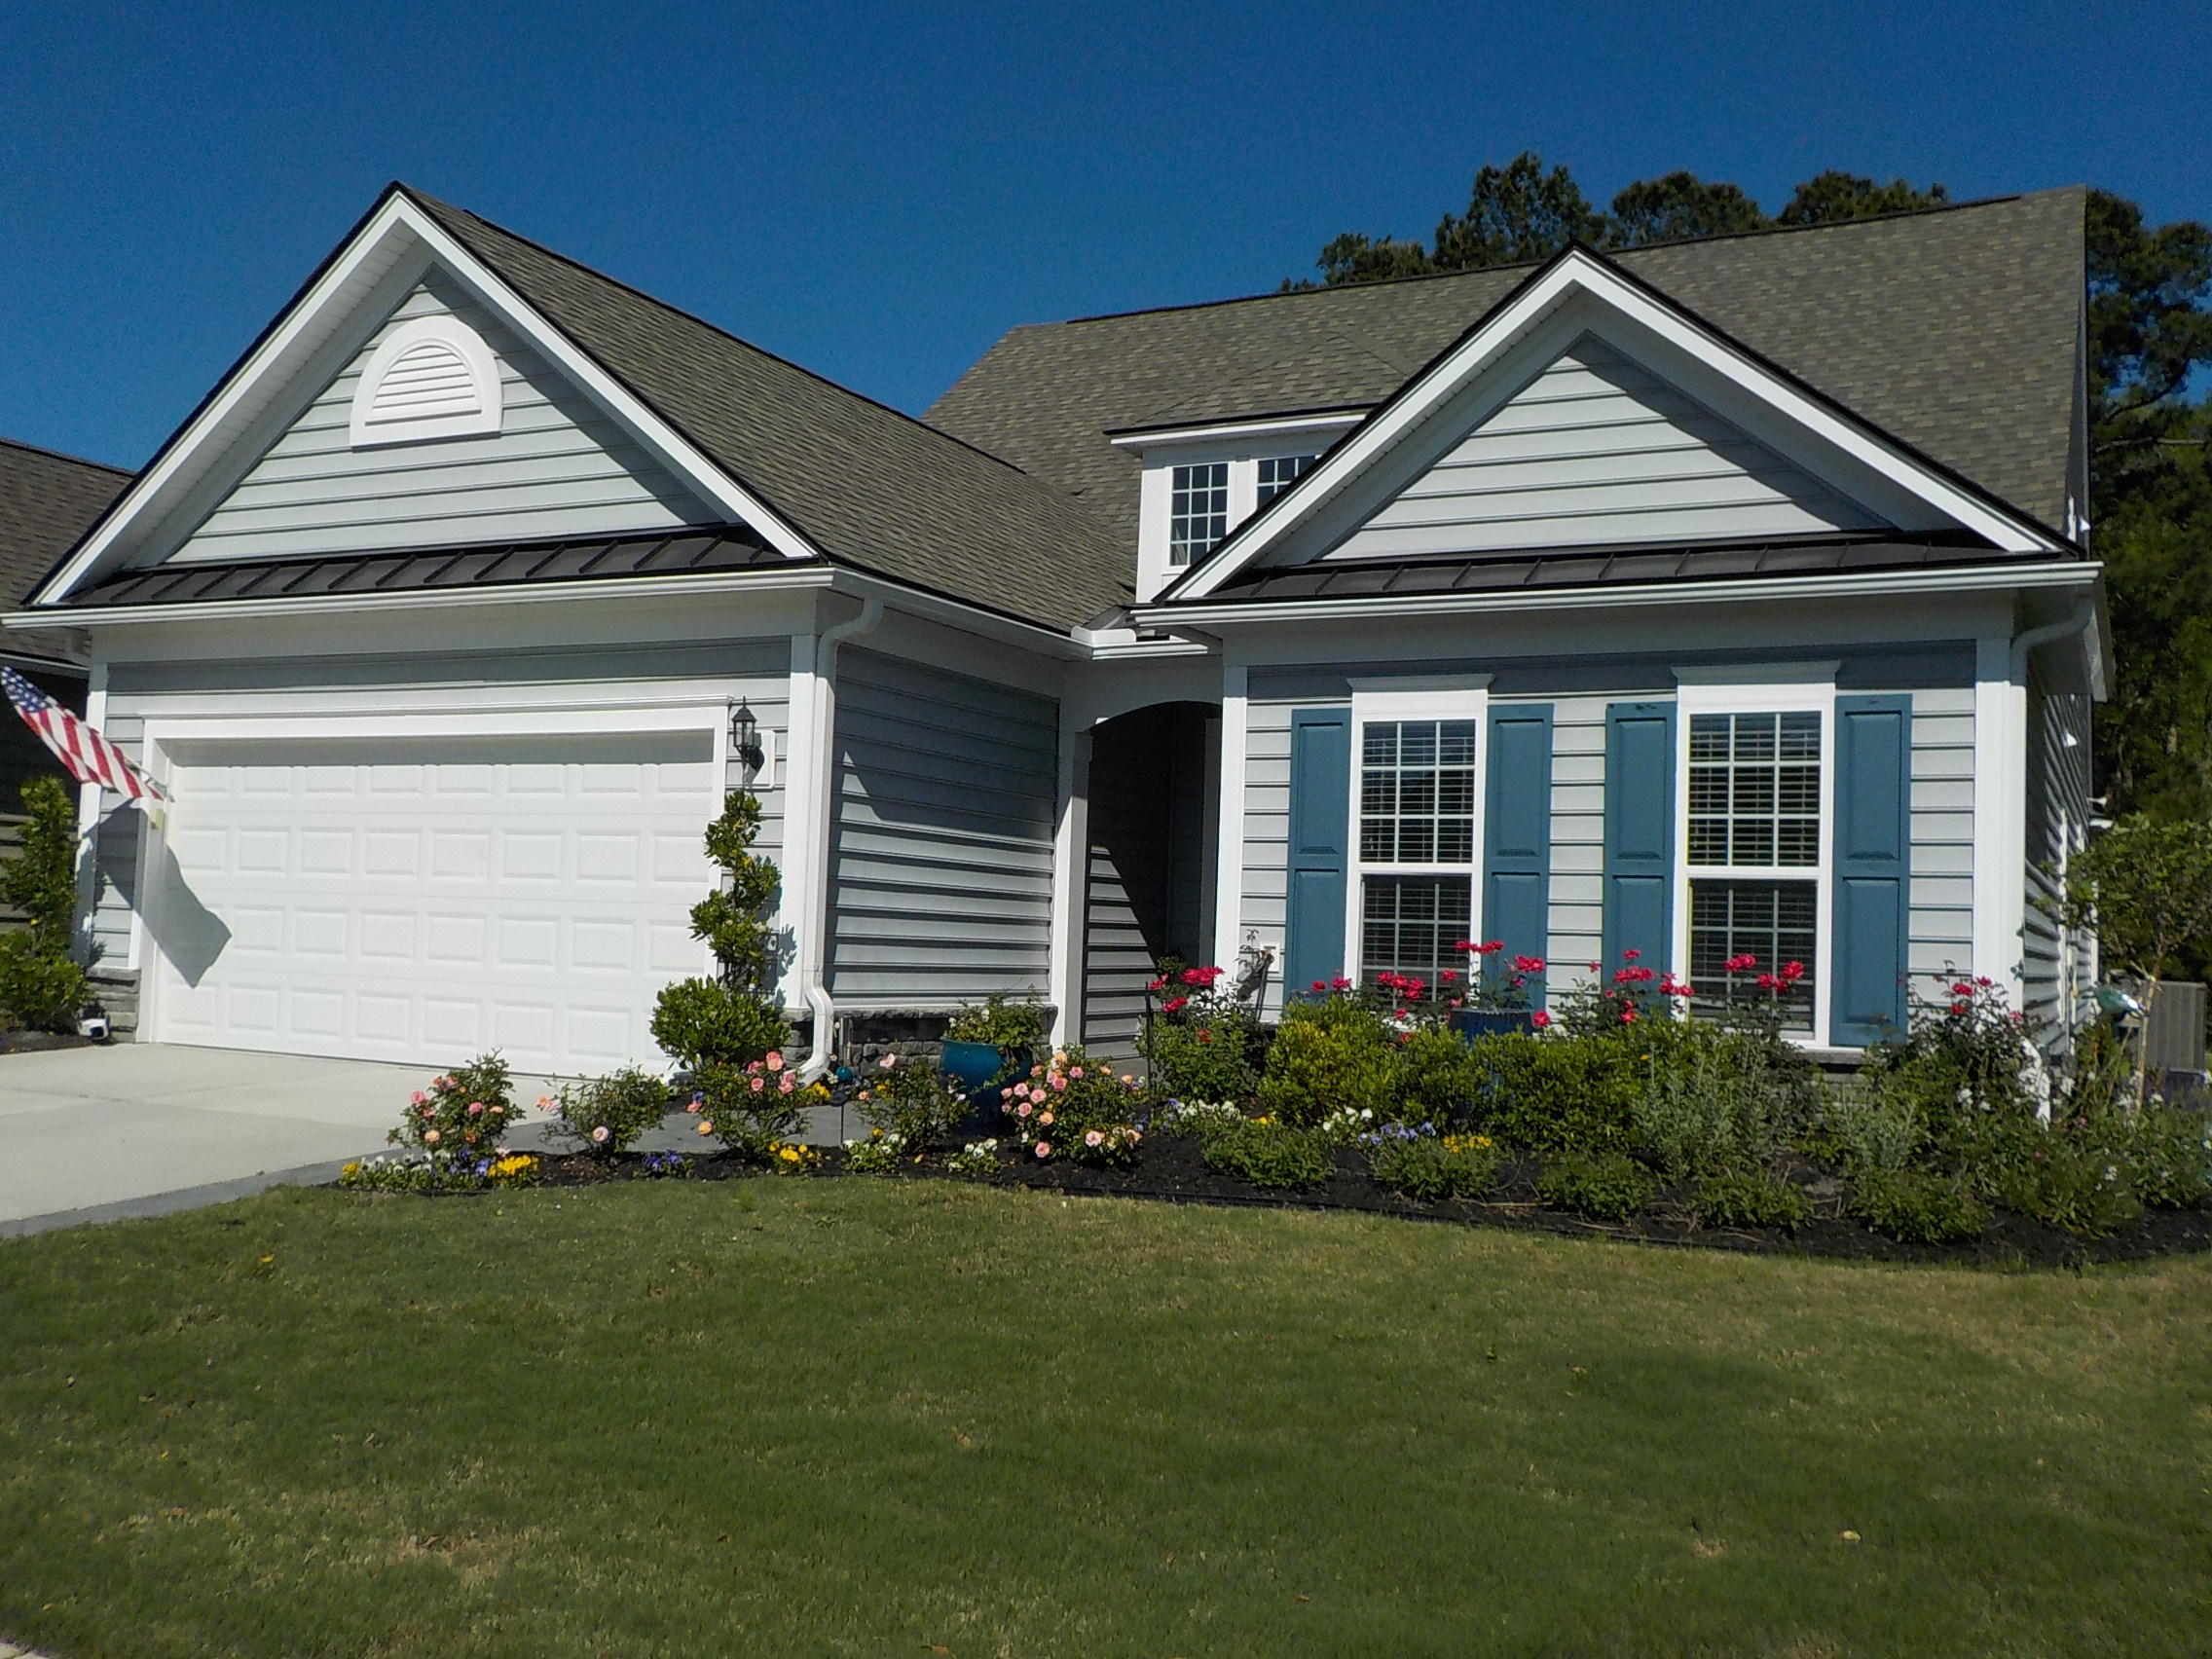 Cane Bay Plantation Homes For Sale - 419 Eastern Isle, Summerville, SC - 0